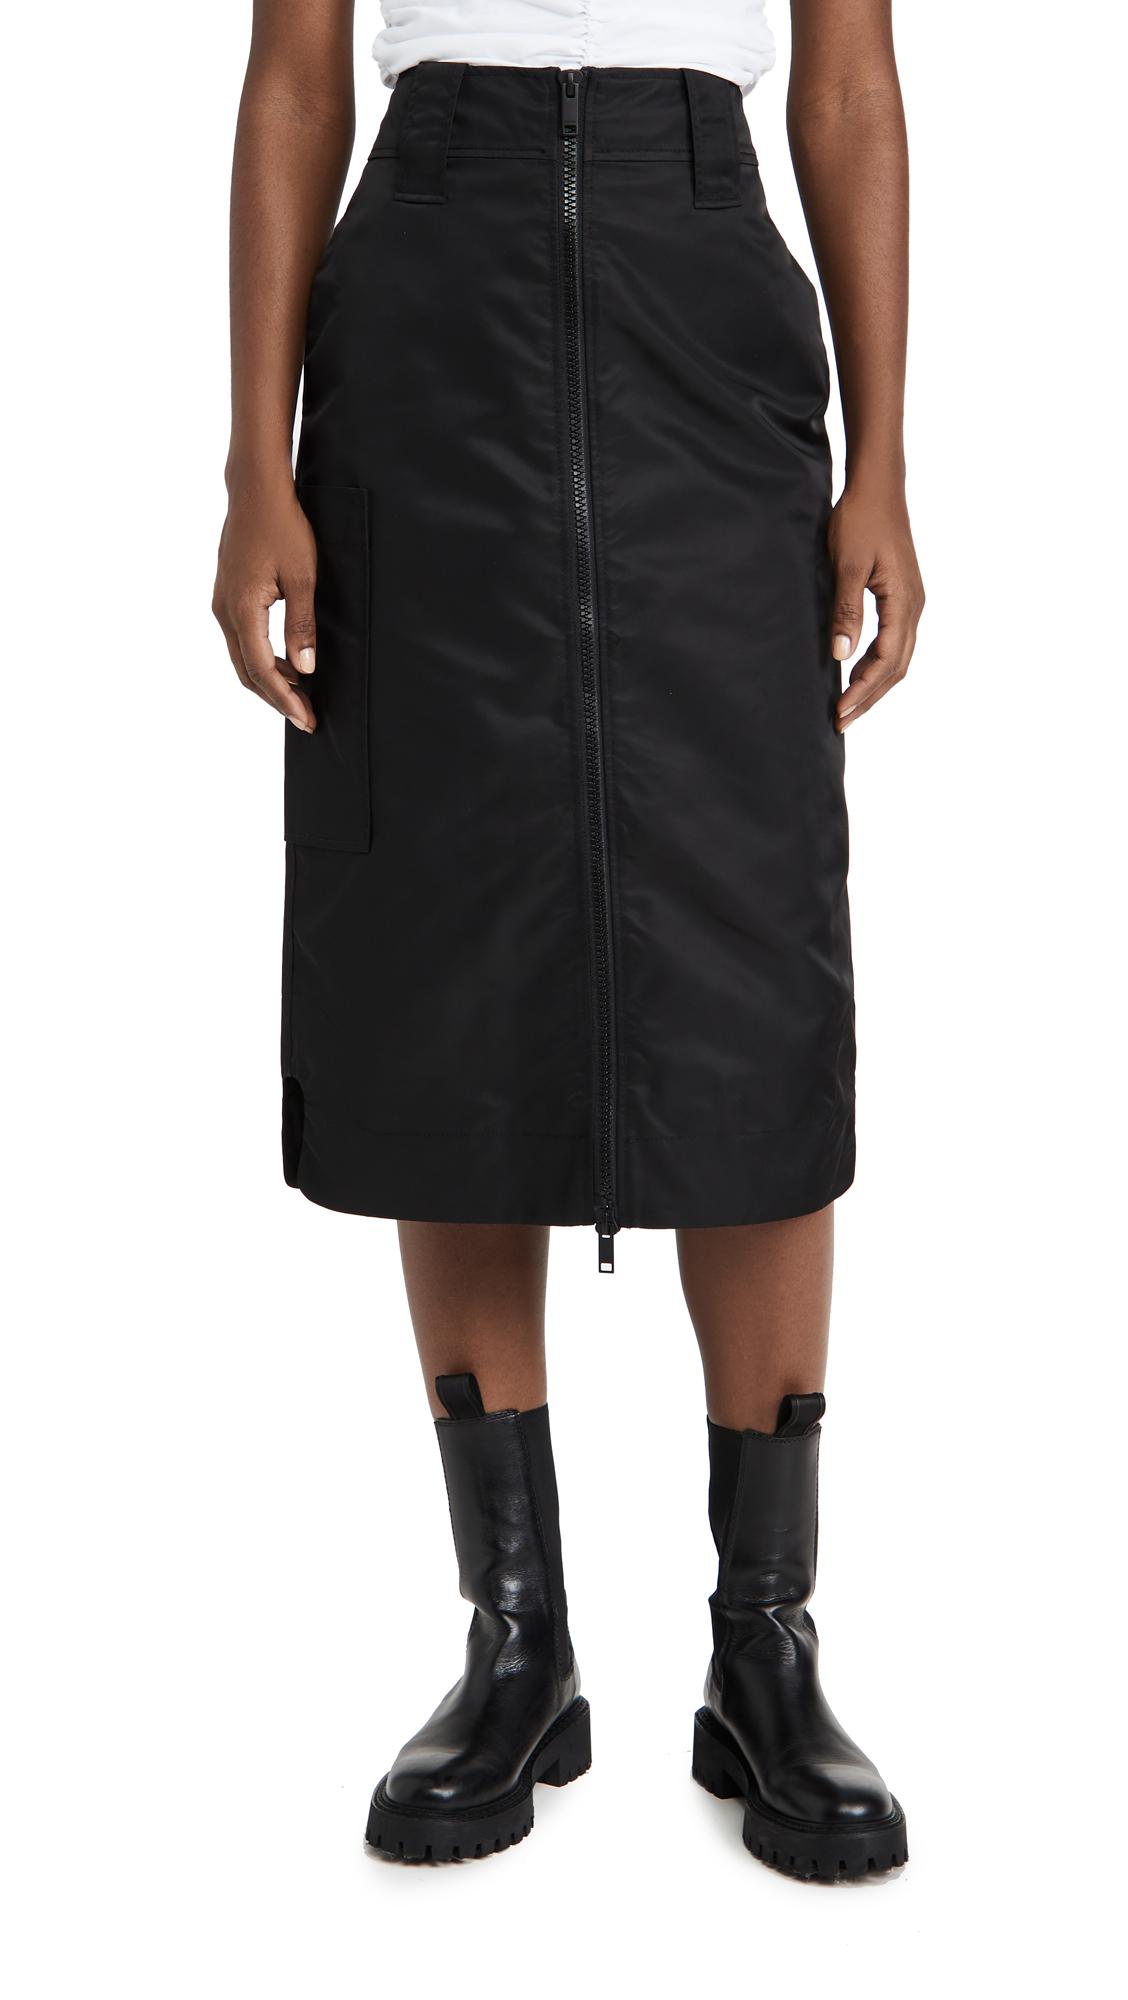 GANNI Outerwear Nylon Skirt